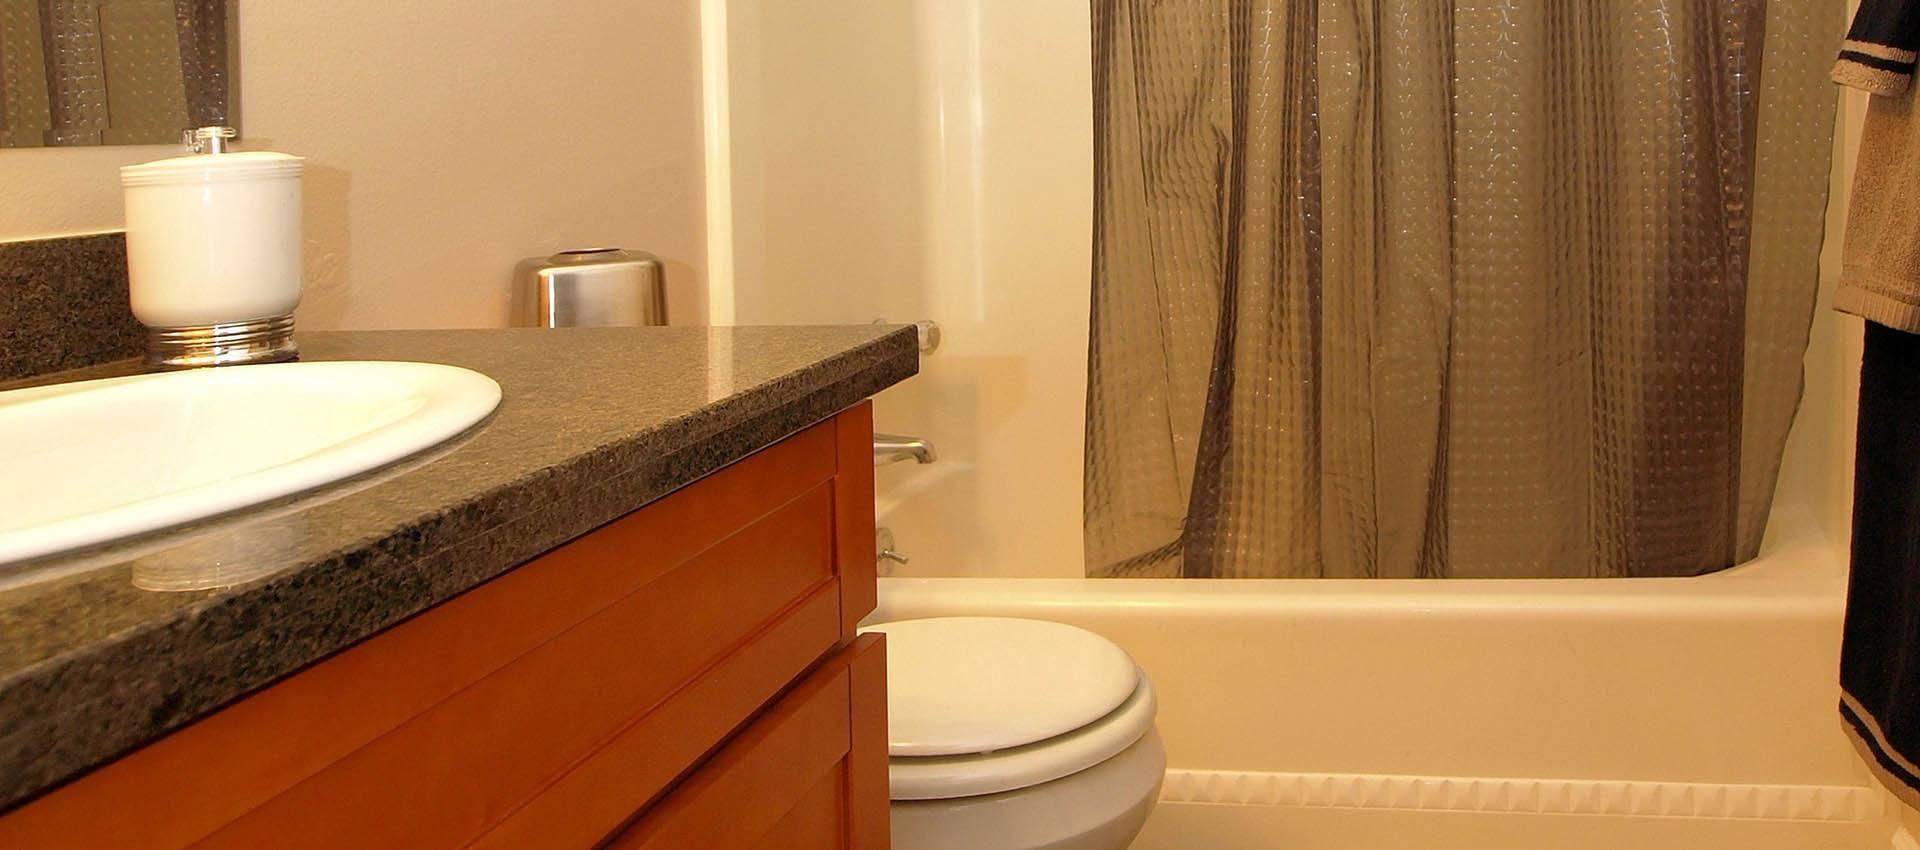 Bathroom at Spring Lake Apartment Homes in Santa Rosa, CA